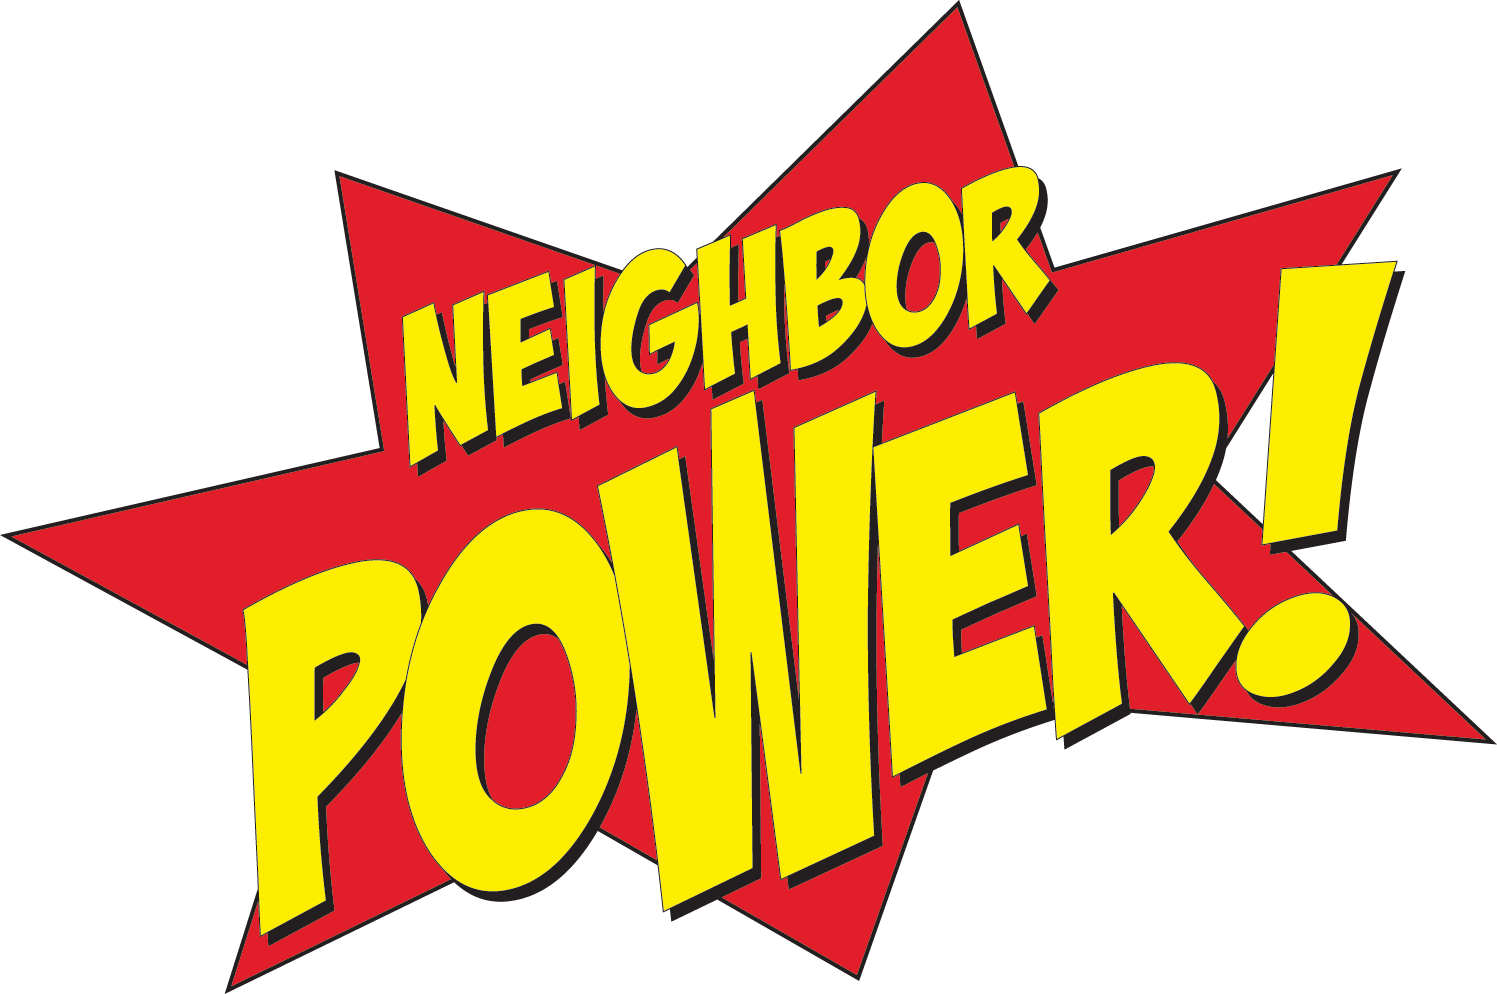 Parks anchorage foundation neighborpowerfinal. Neighborhood clipart neighborhood park